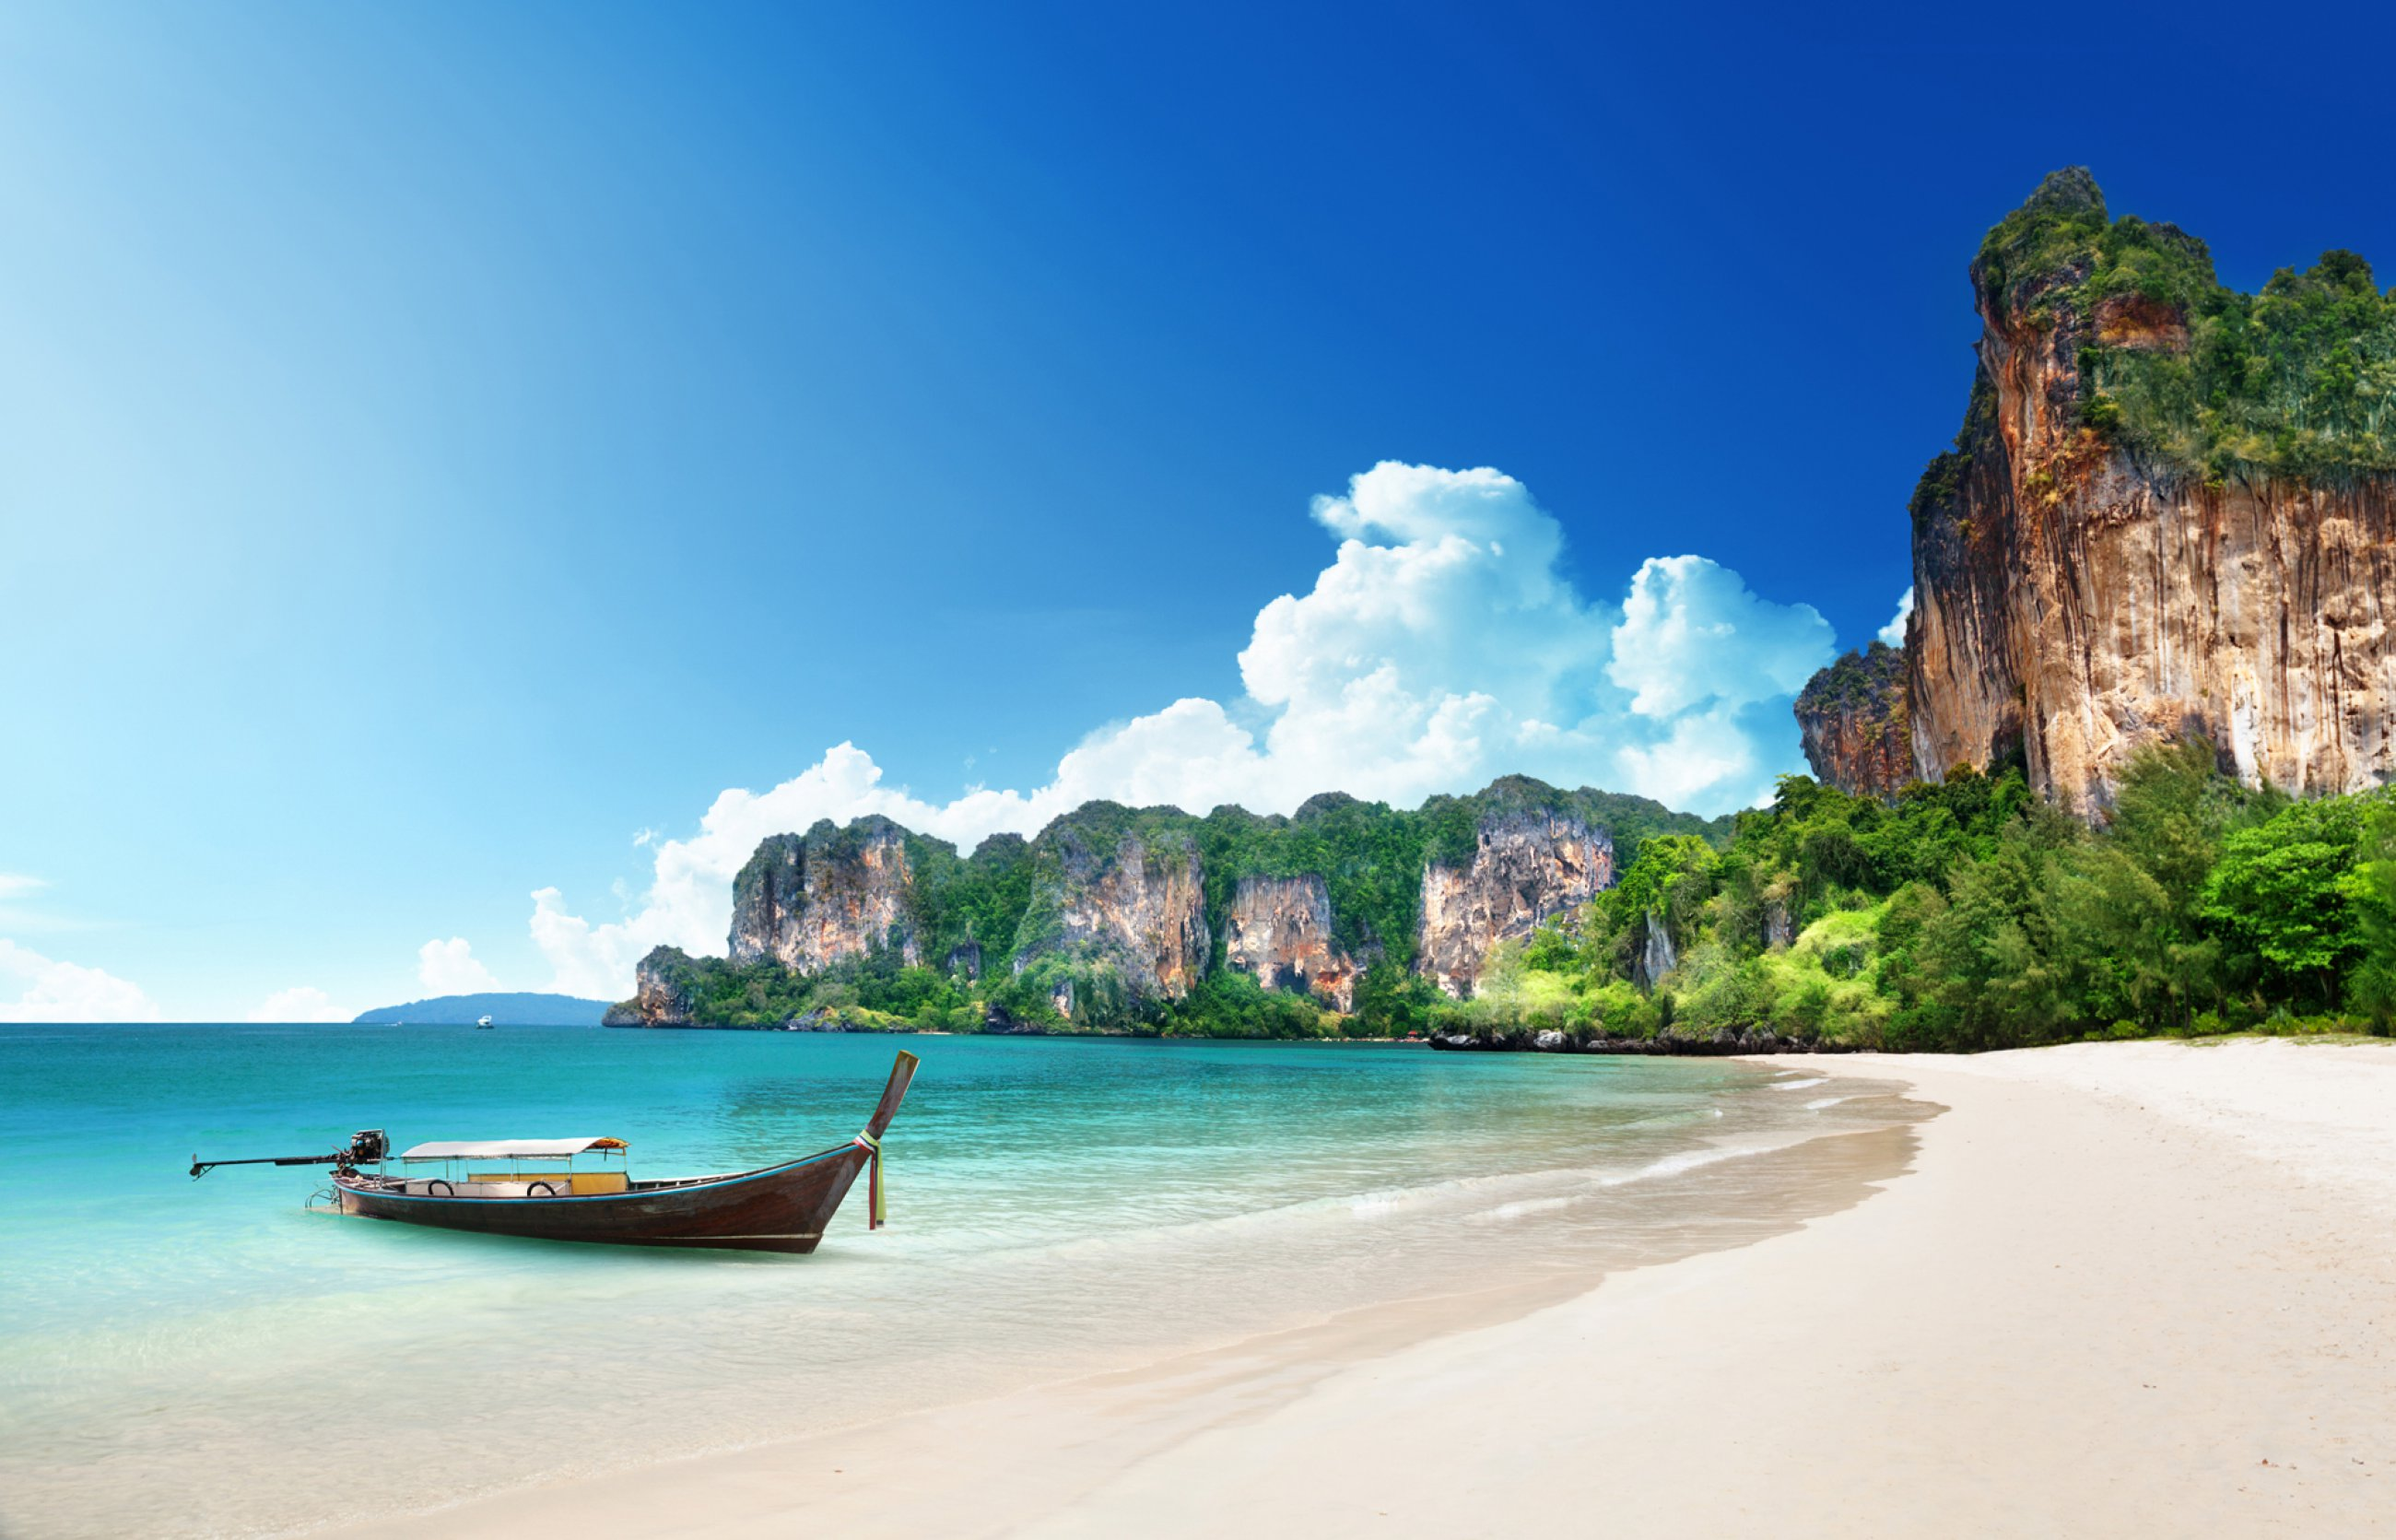 https://bubo.sk/uploads/galleries/5064/krabi-thajsko-railay-beach-dreamstime-xl-28775974.jpg